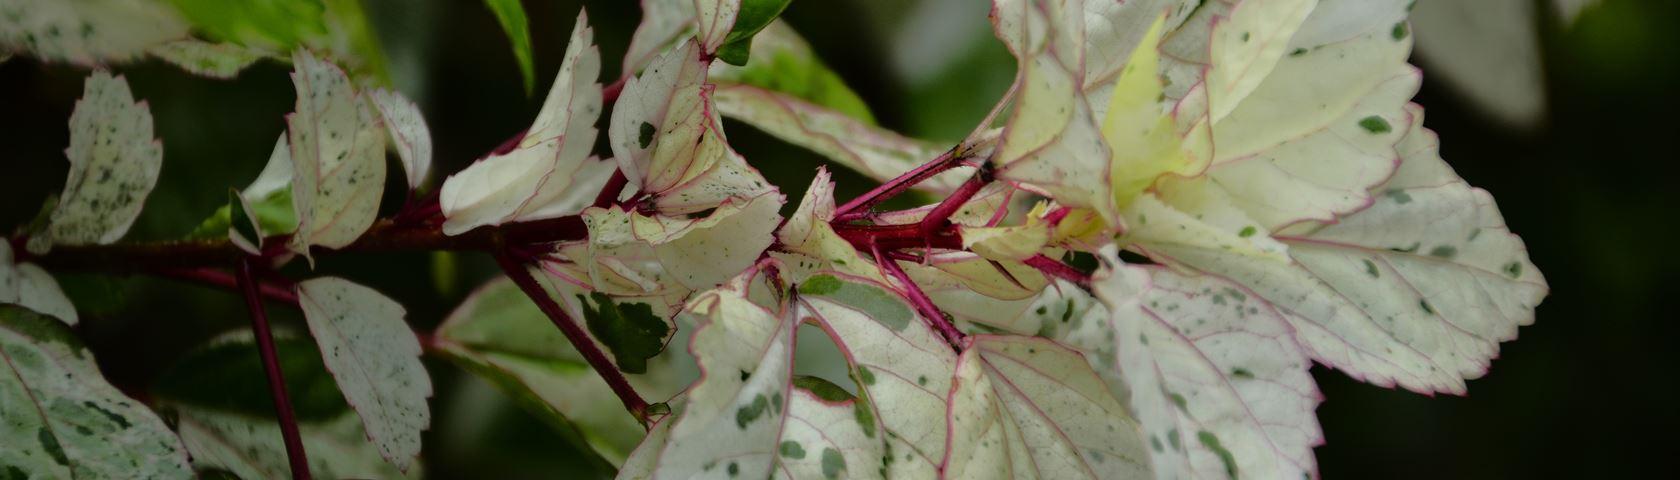 White Leaf Spots